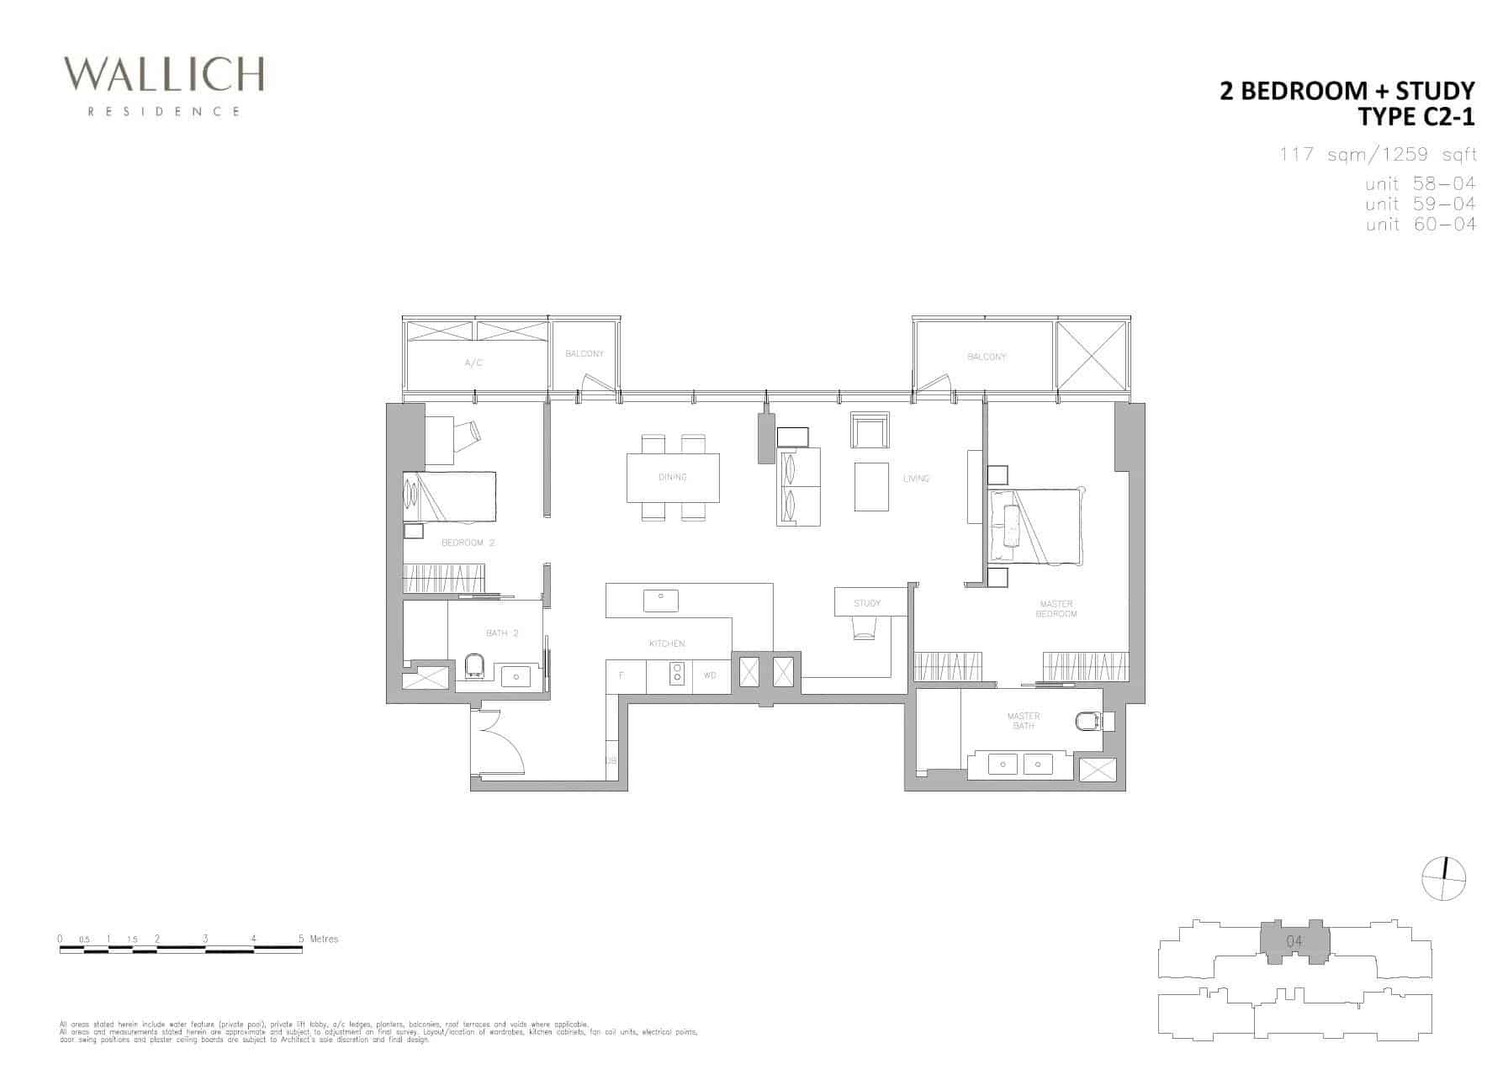 Wallich Residence Type C2-1